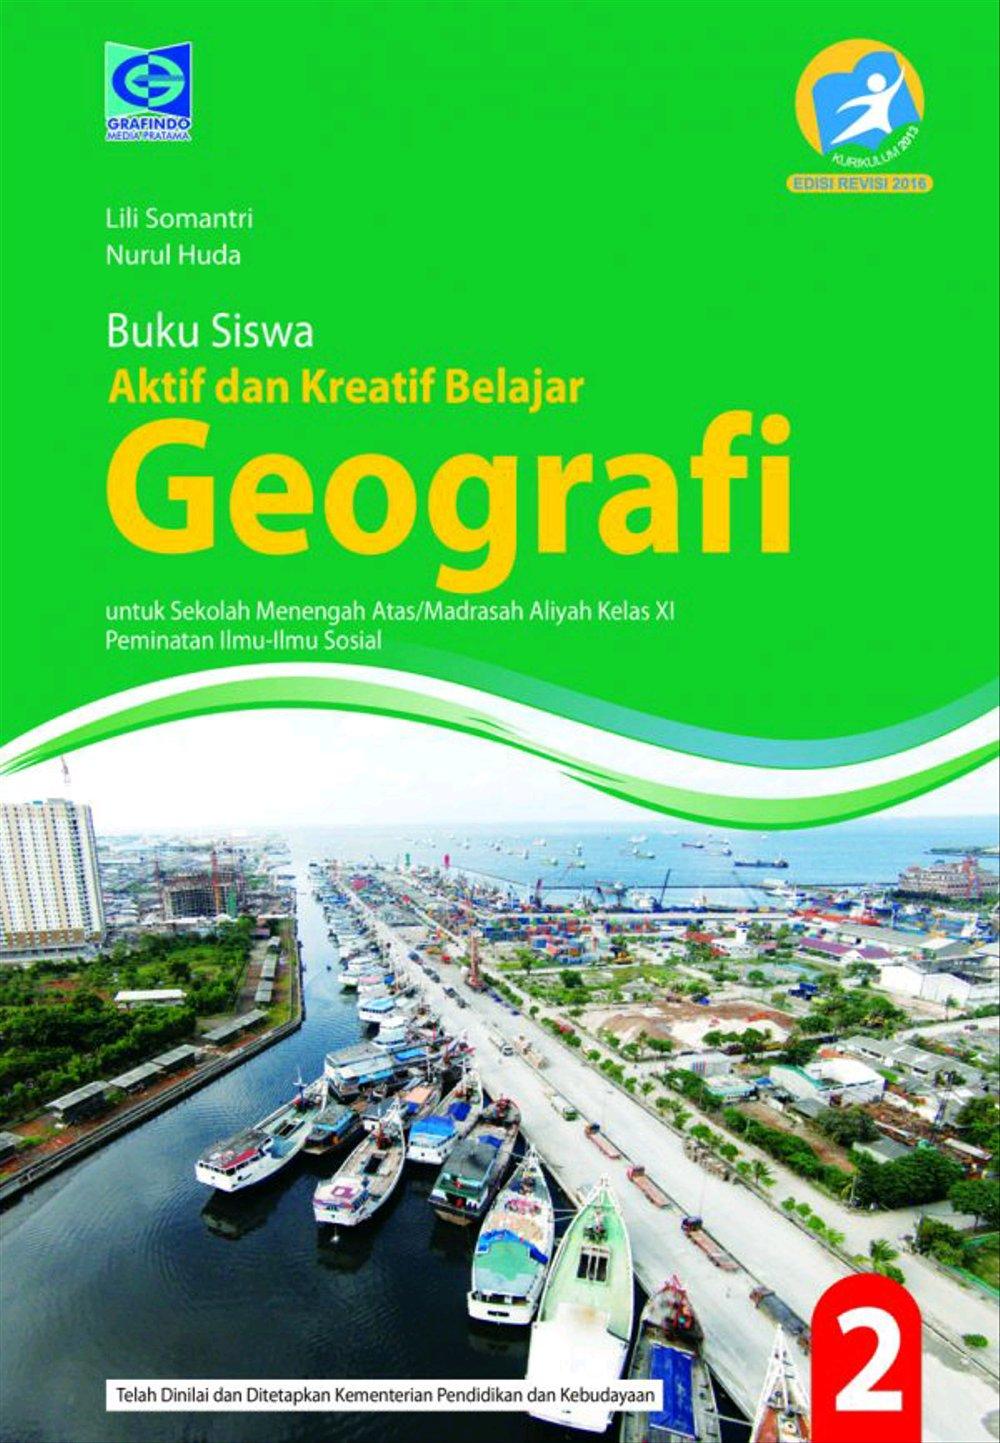 Buku Geografi Kelas 11 Kurikulum 2013 Revisi Pdf : geografi, kelas, kurikulum, revisi, Paket, Geografi, Kelas, Kurikulum, IlmuSosial.id